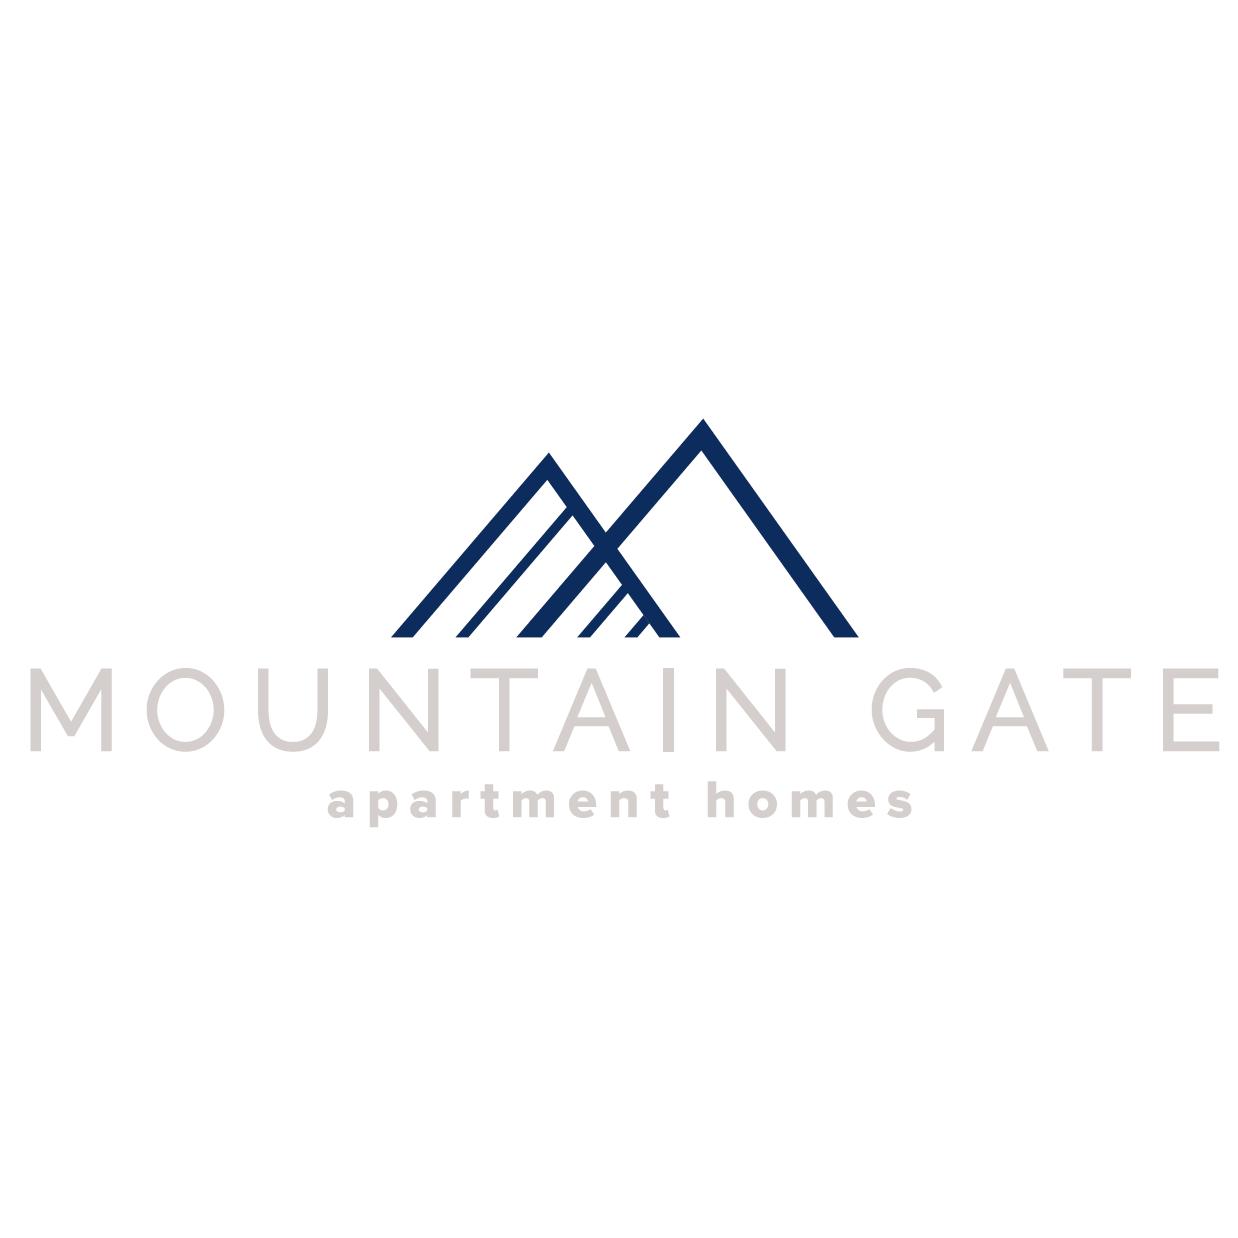 Mountain Gate Apartment Homes - Littleton, CO - Apartments